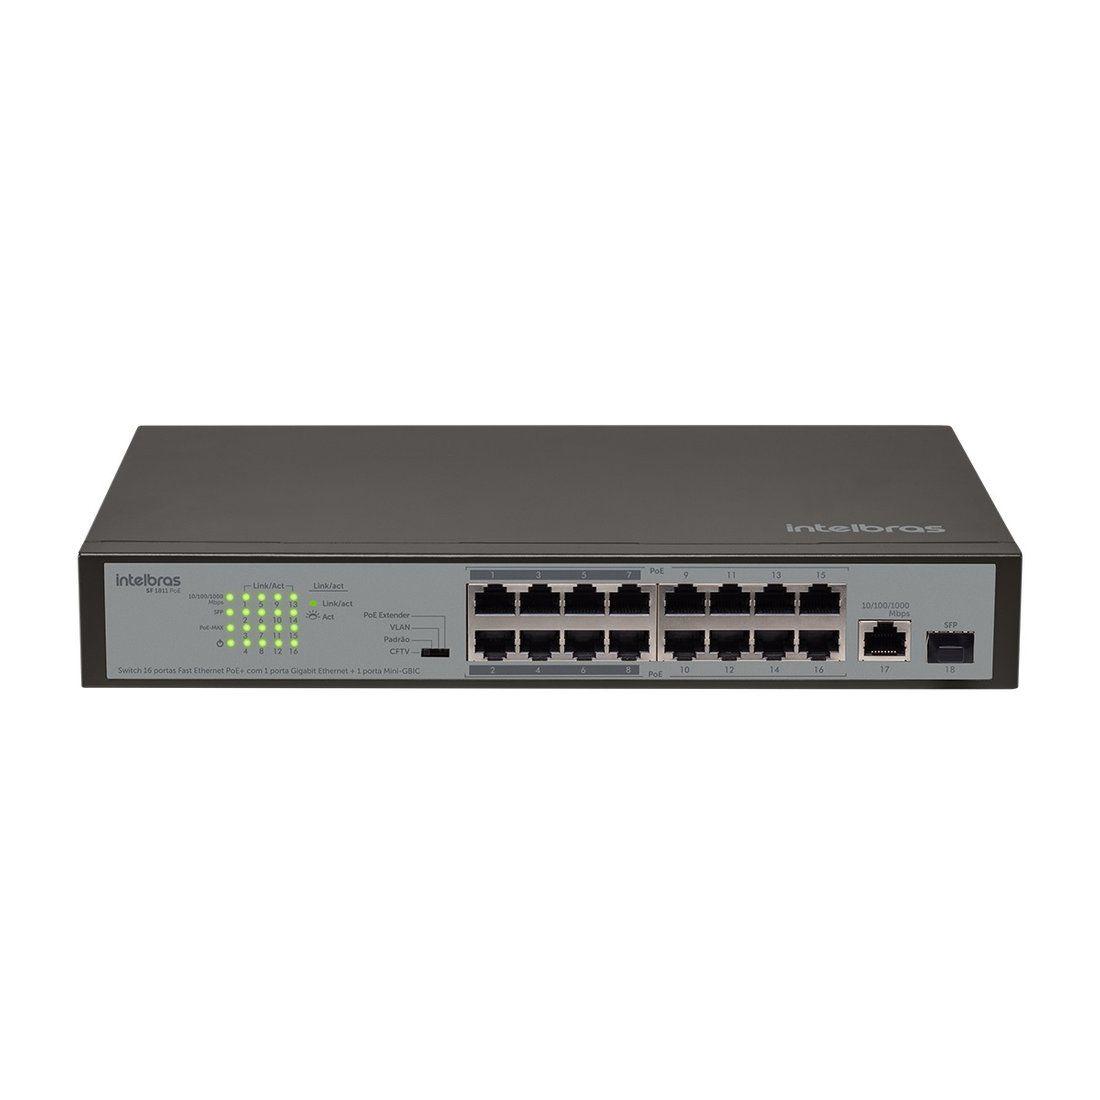 Switch Intelbras SF 1811 PoE 16P Fast PoE 1P Gigabit 1P SFP